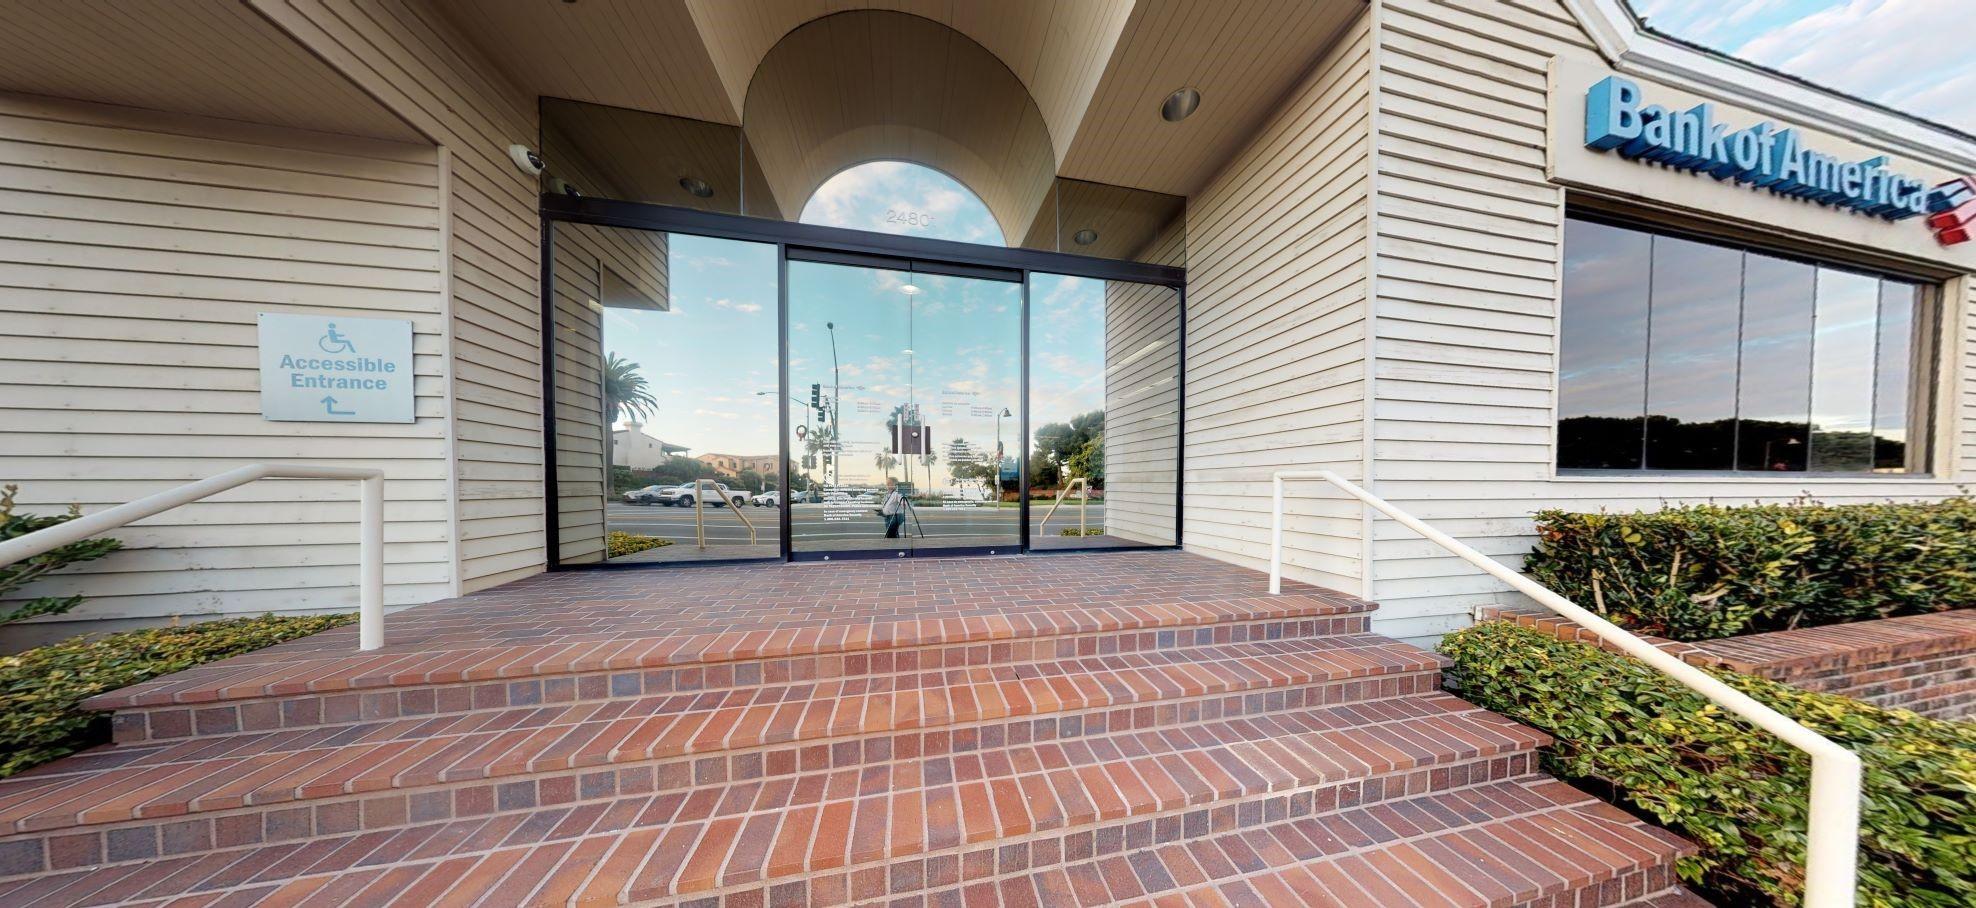 Bank of America financial center with walk-up ATM | 24801 Del Prado Ave, Dana Point, CA 92629